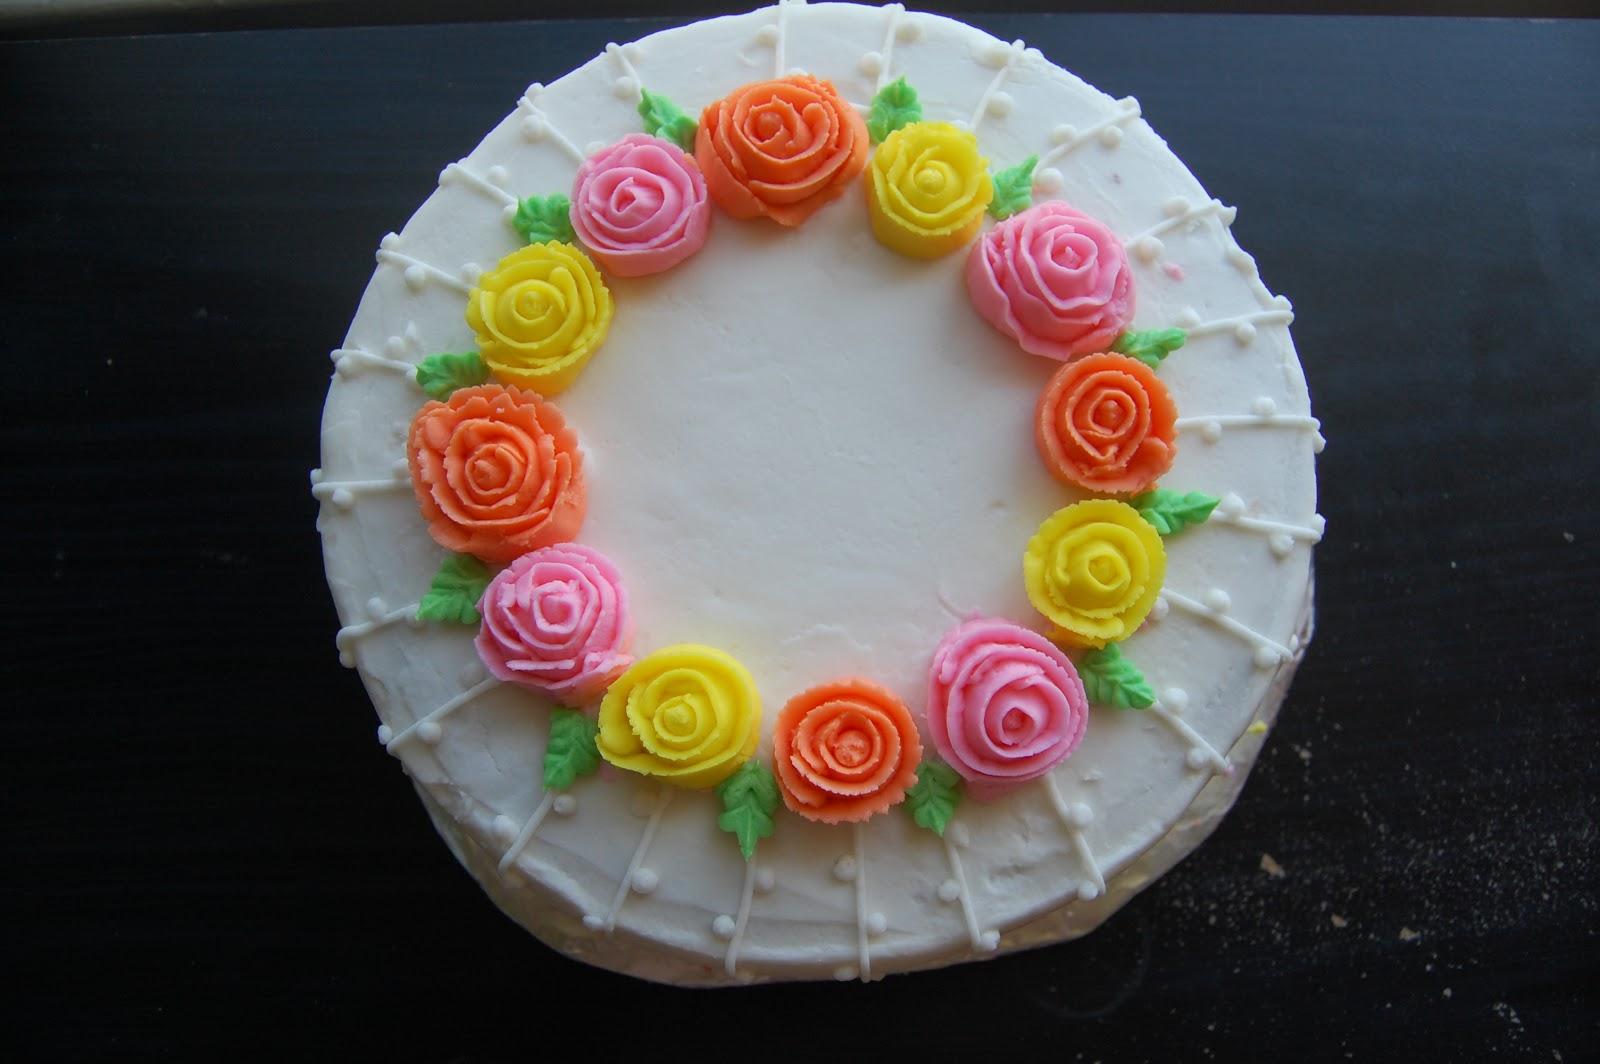 ilovecakes wilton cake decorating course cakes - Cake Decorating Classes Near Me